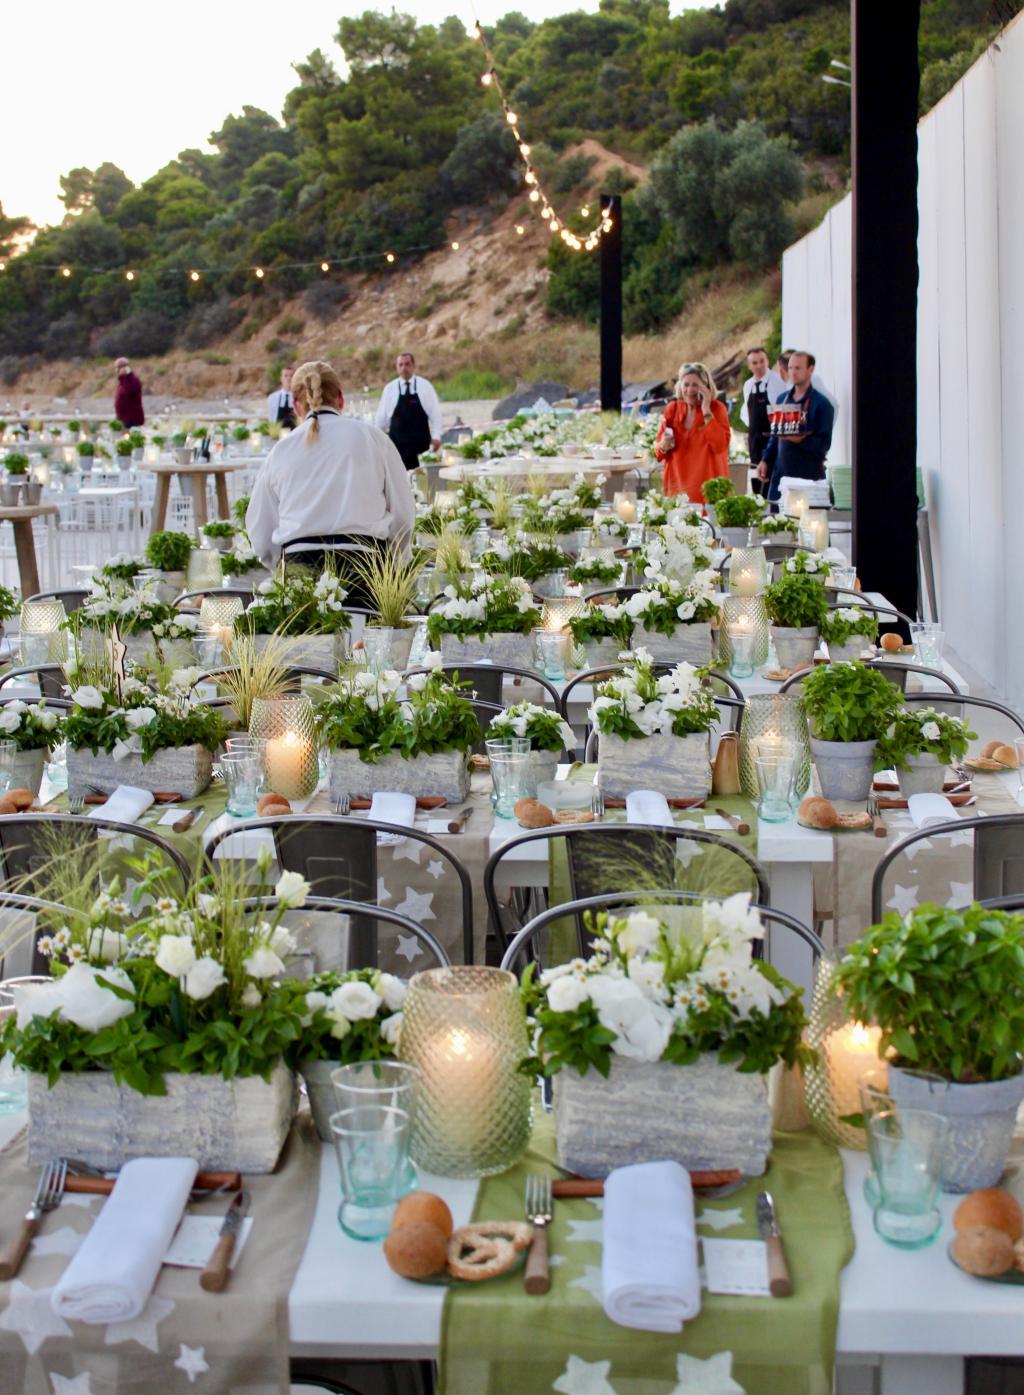 K&K Skiathos wedding - Image 15